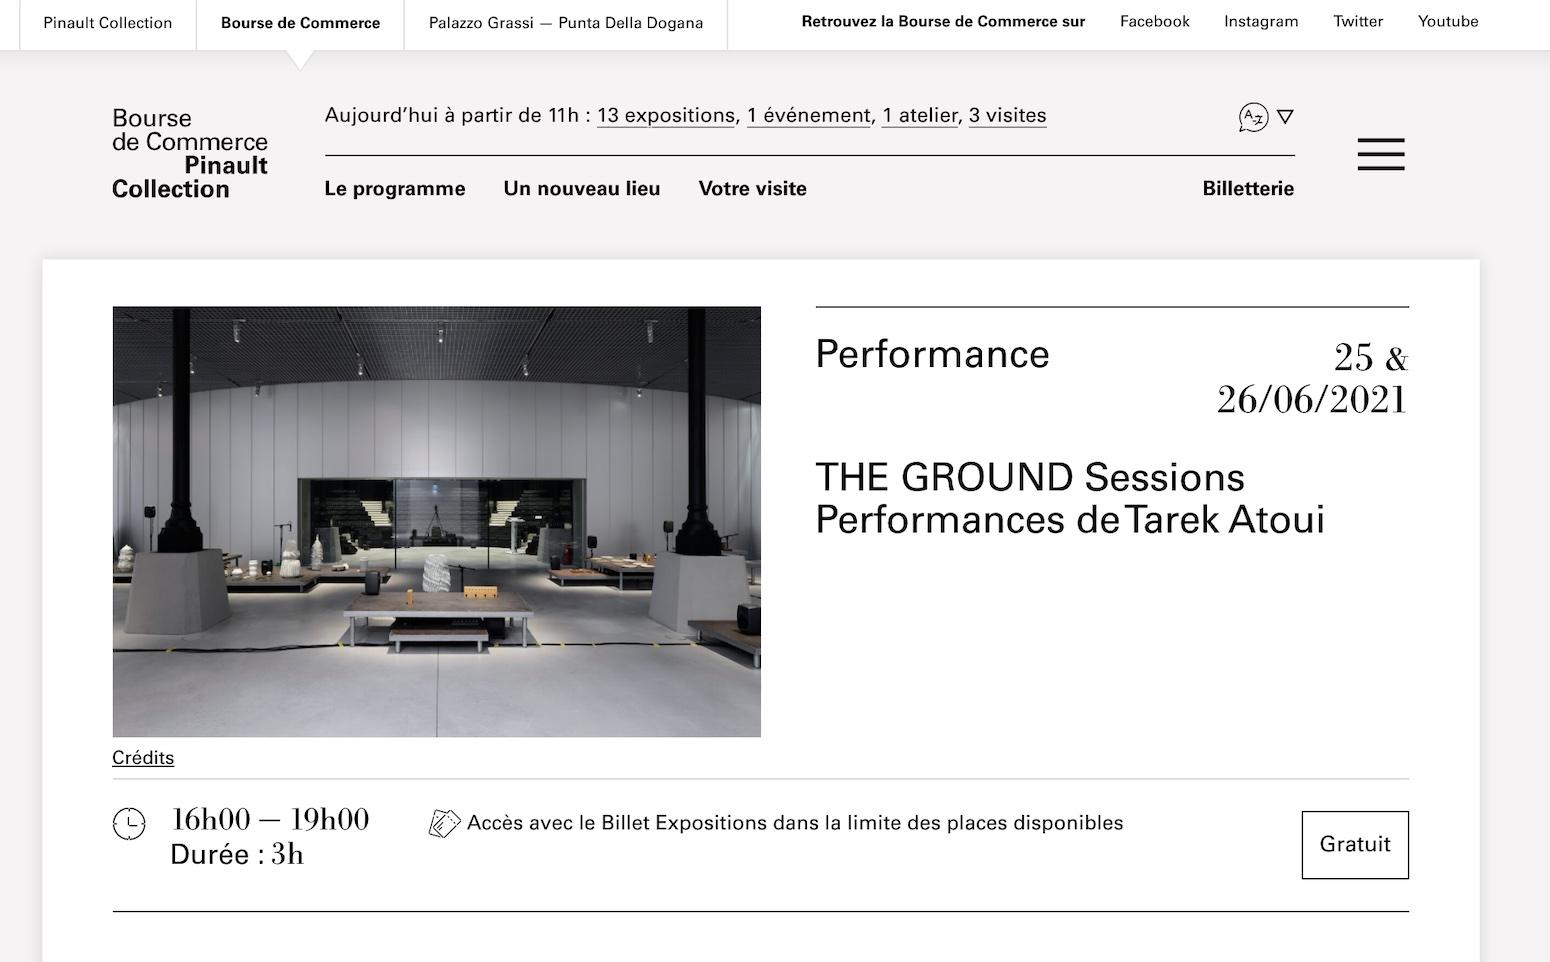 THE GROUND Sessions Paris